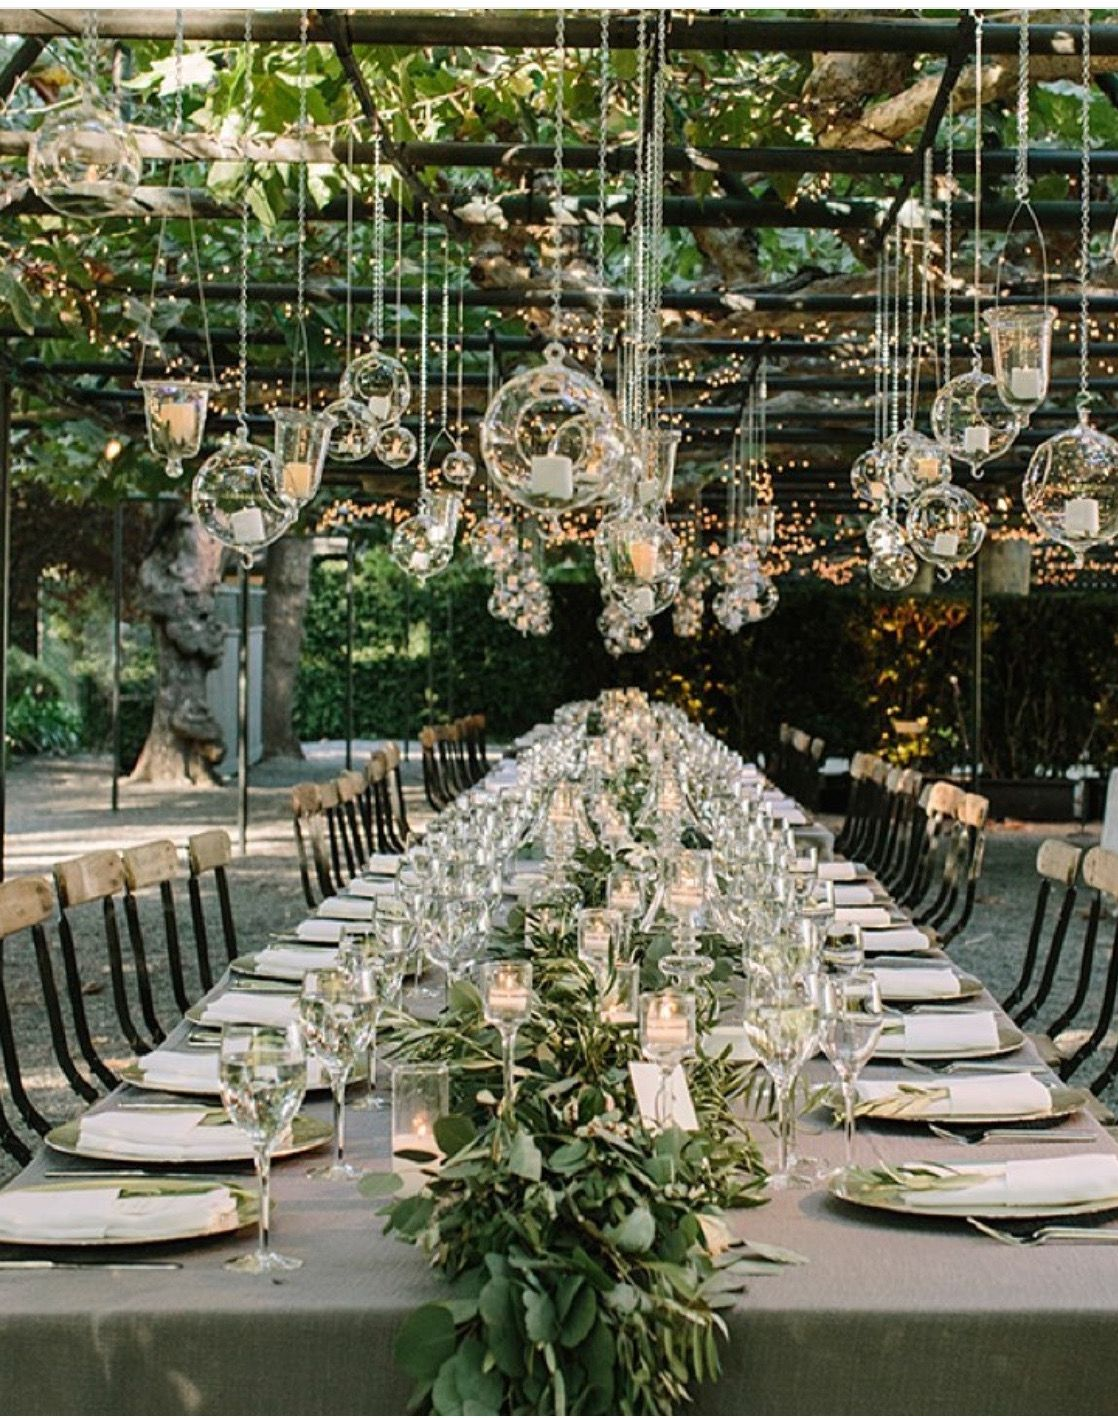 Wedding decor garlands along table hanging votives and lights wedding decor garlands along table hanging votives and lights junglespirit Choice Image